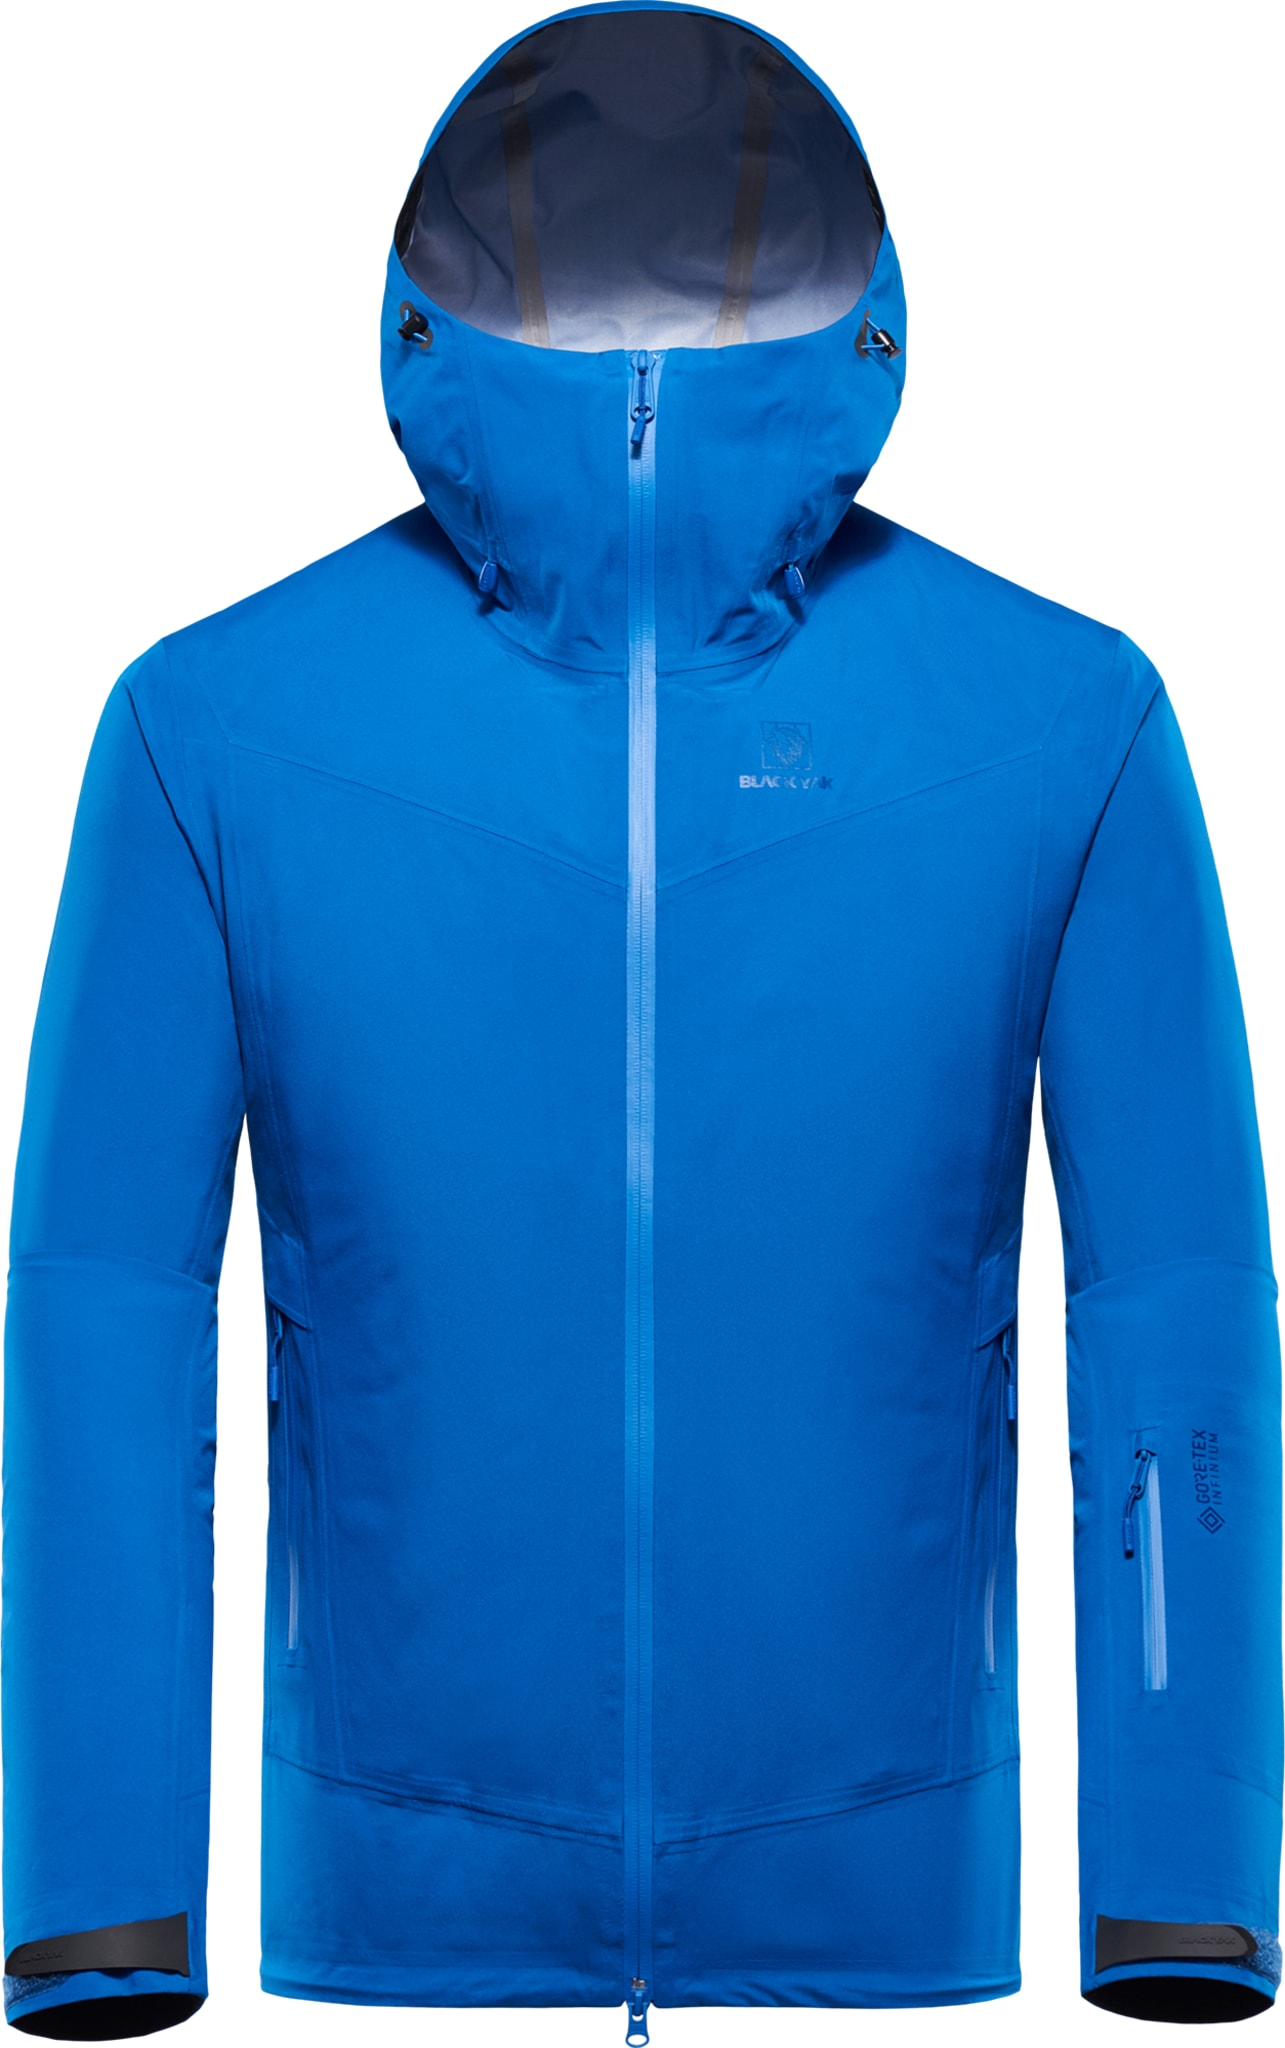 Kostroma Jacket Ms